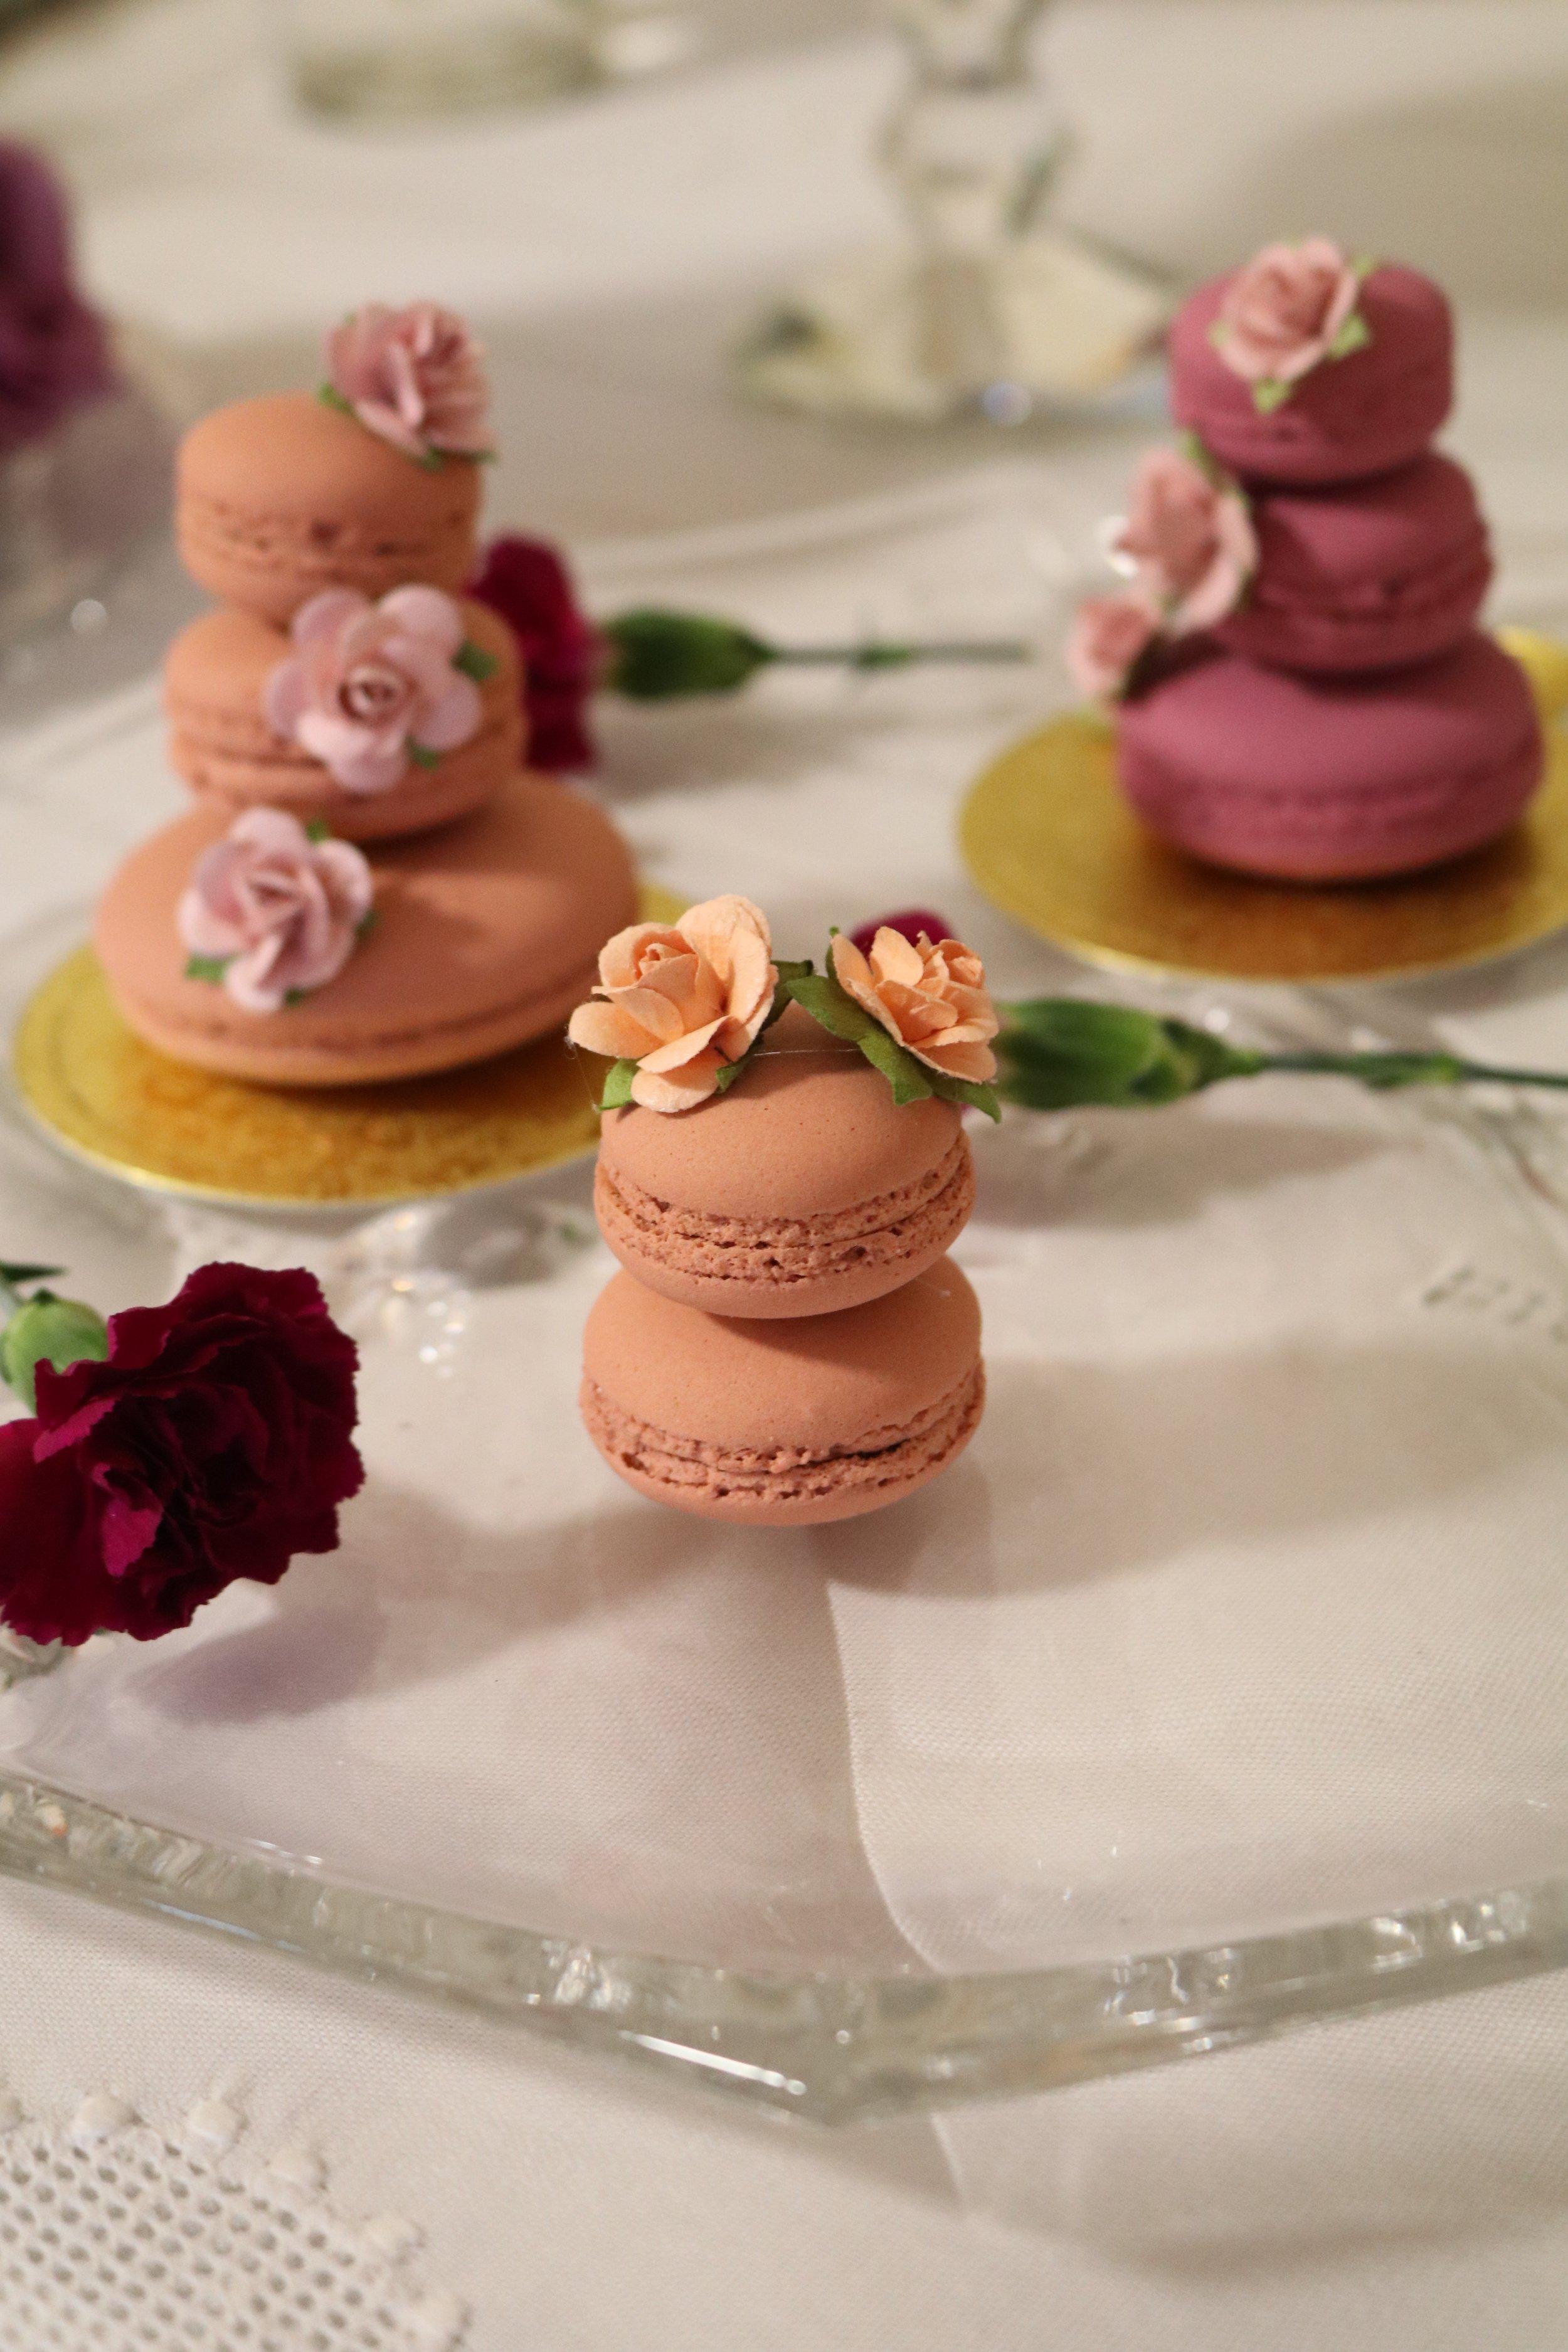 french macaron - Chef Ione Cavalli New York.jpg